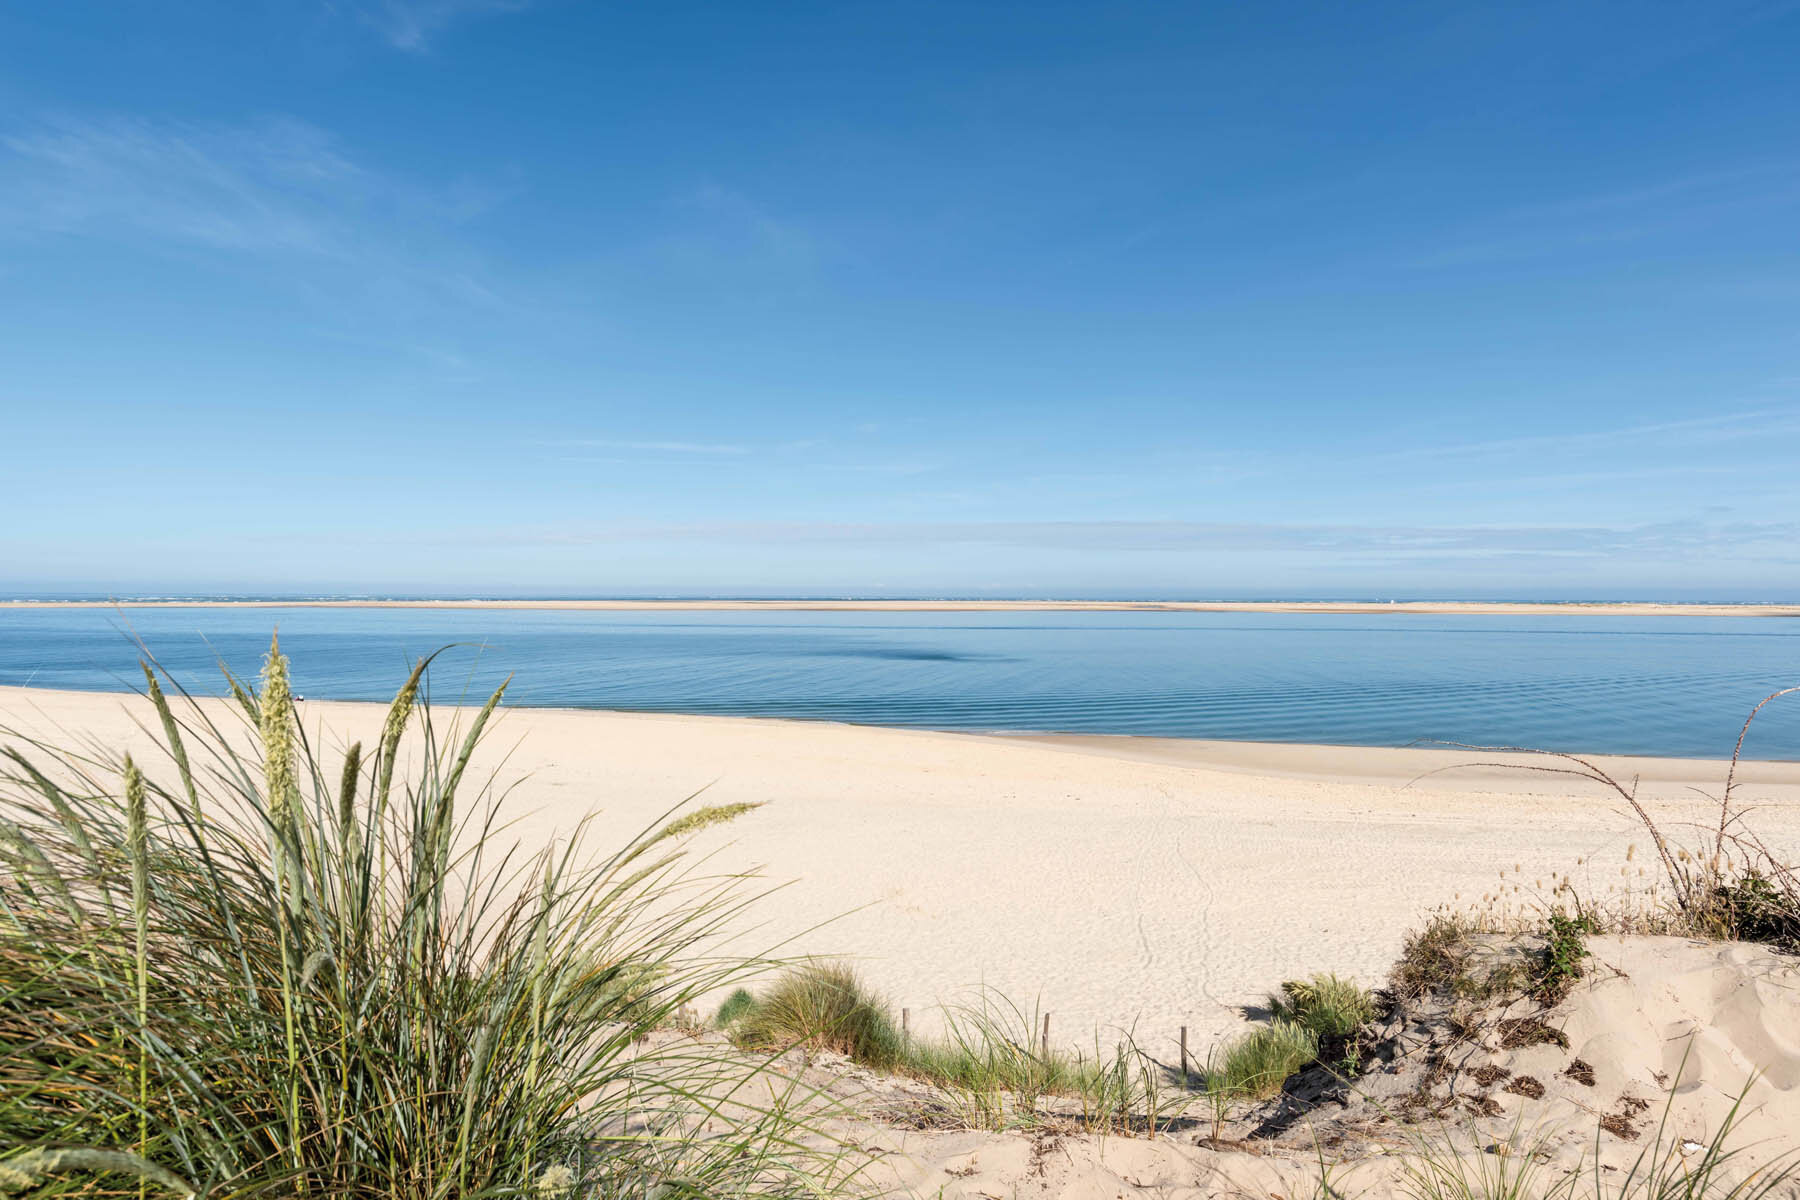 PlateART Duschrückwand mit Motiv Strand und Meer Ostsee Düne